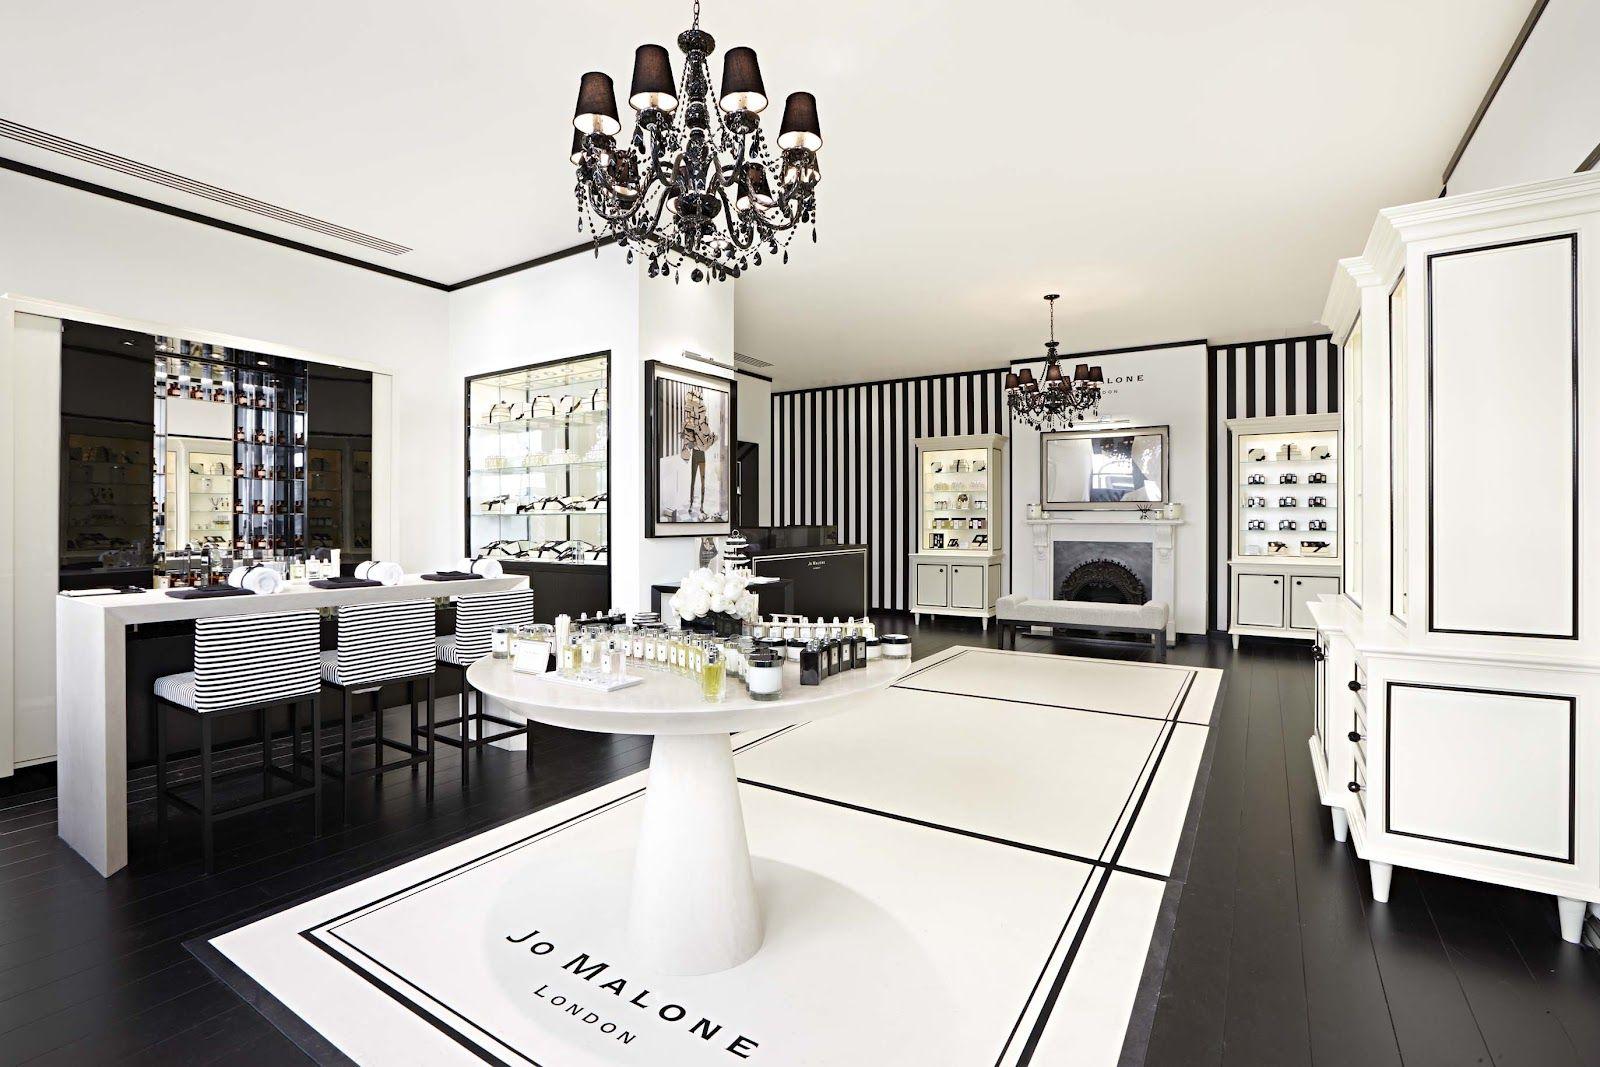 Jo malone interior unreal home pinterest london for Interior stylist london